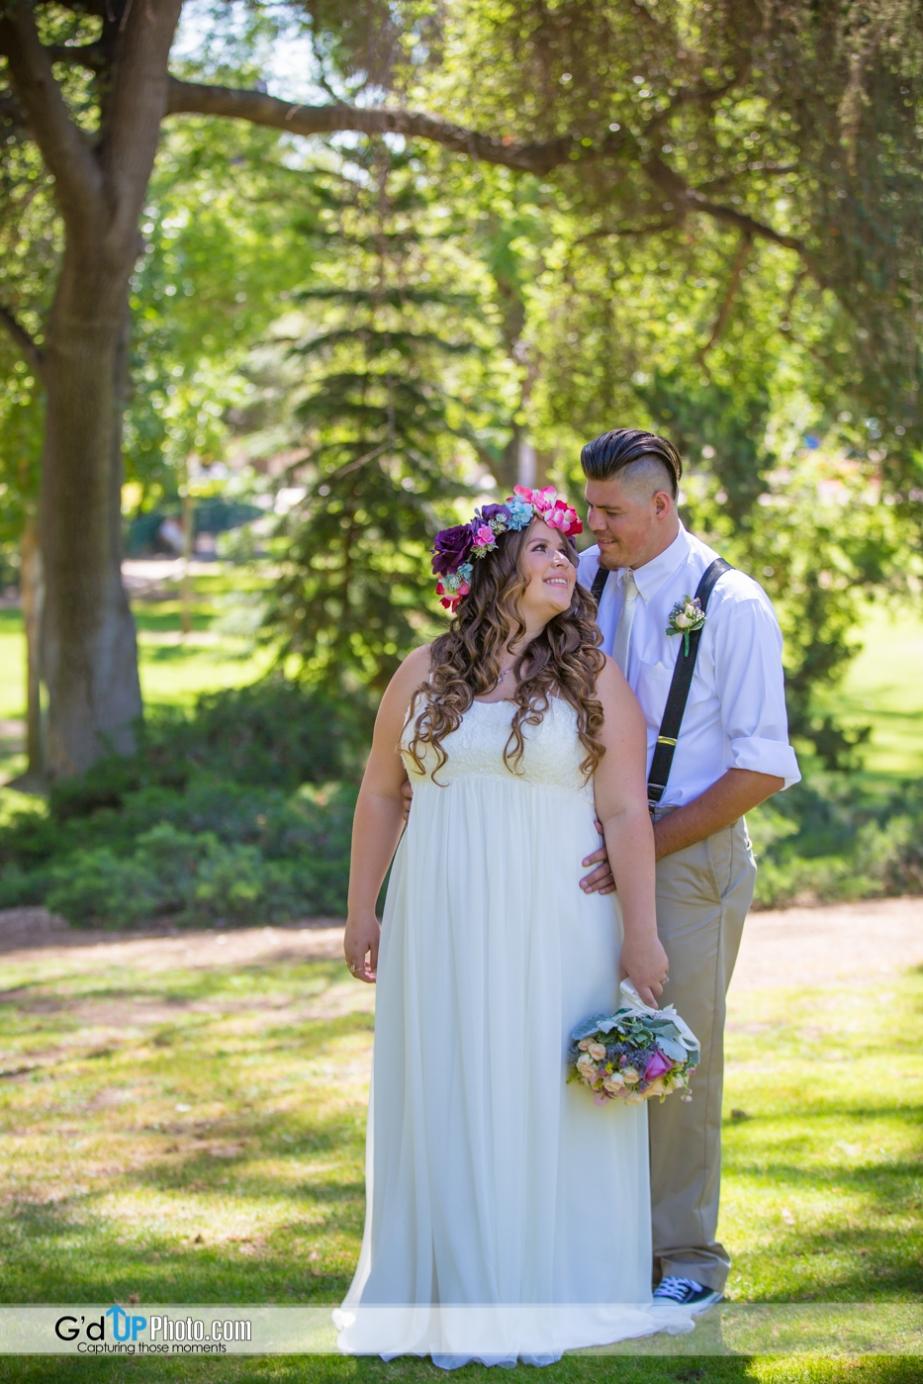 Krista and Jonathan's Penn Park Wedding